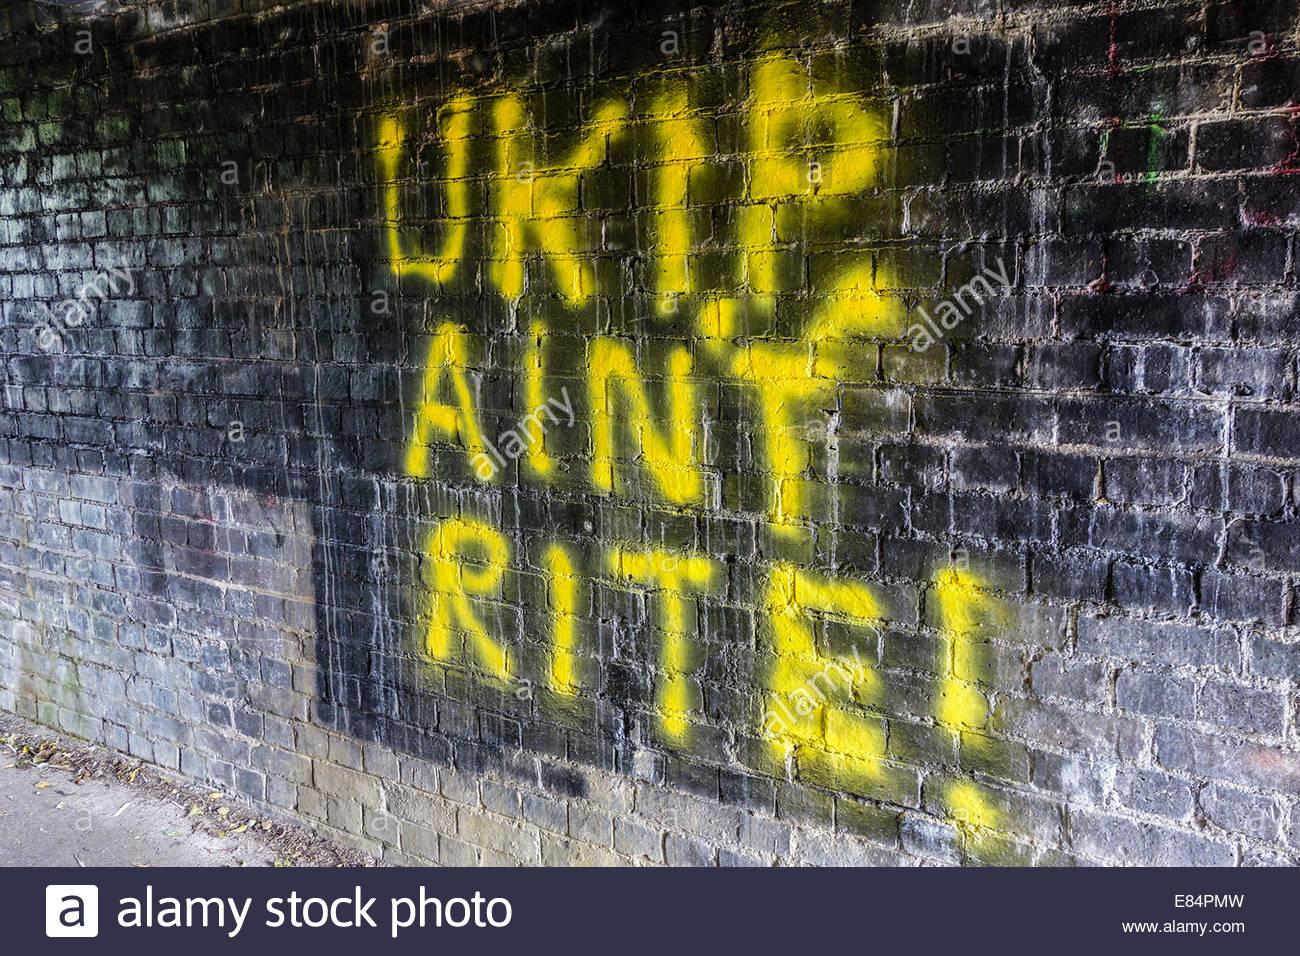 UKIP Ain't Rite (Right) graffiti on a brick wall in Cambridge, England UK - Stock Image